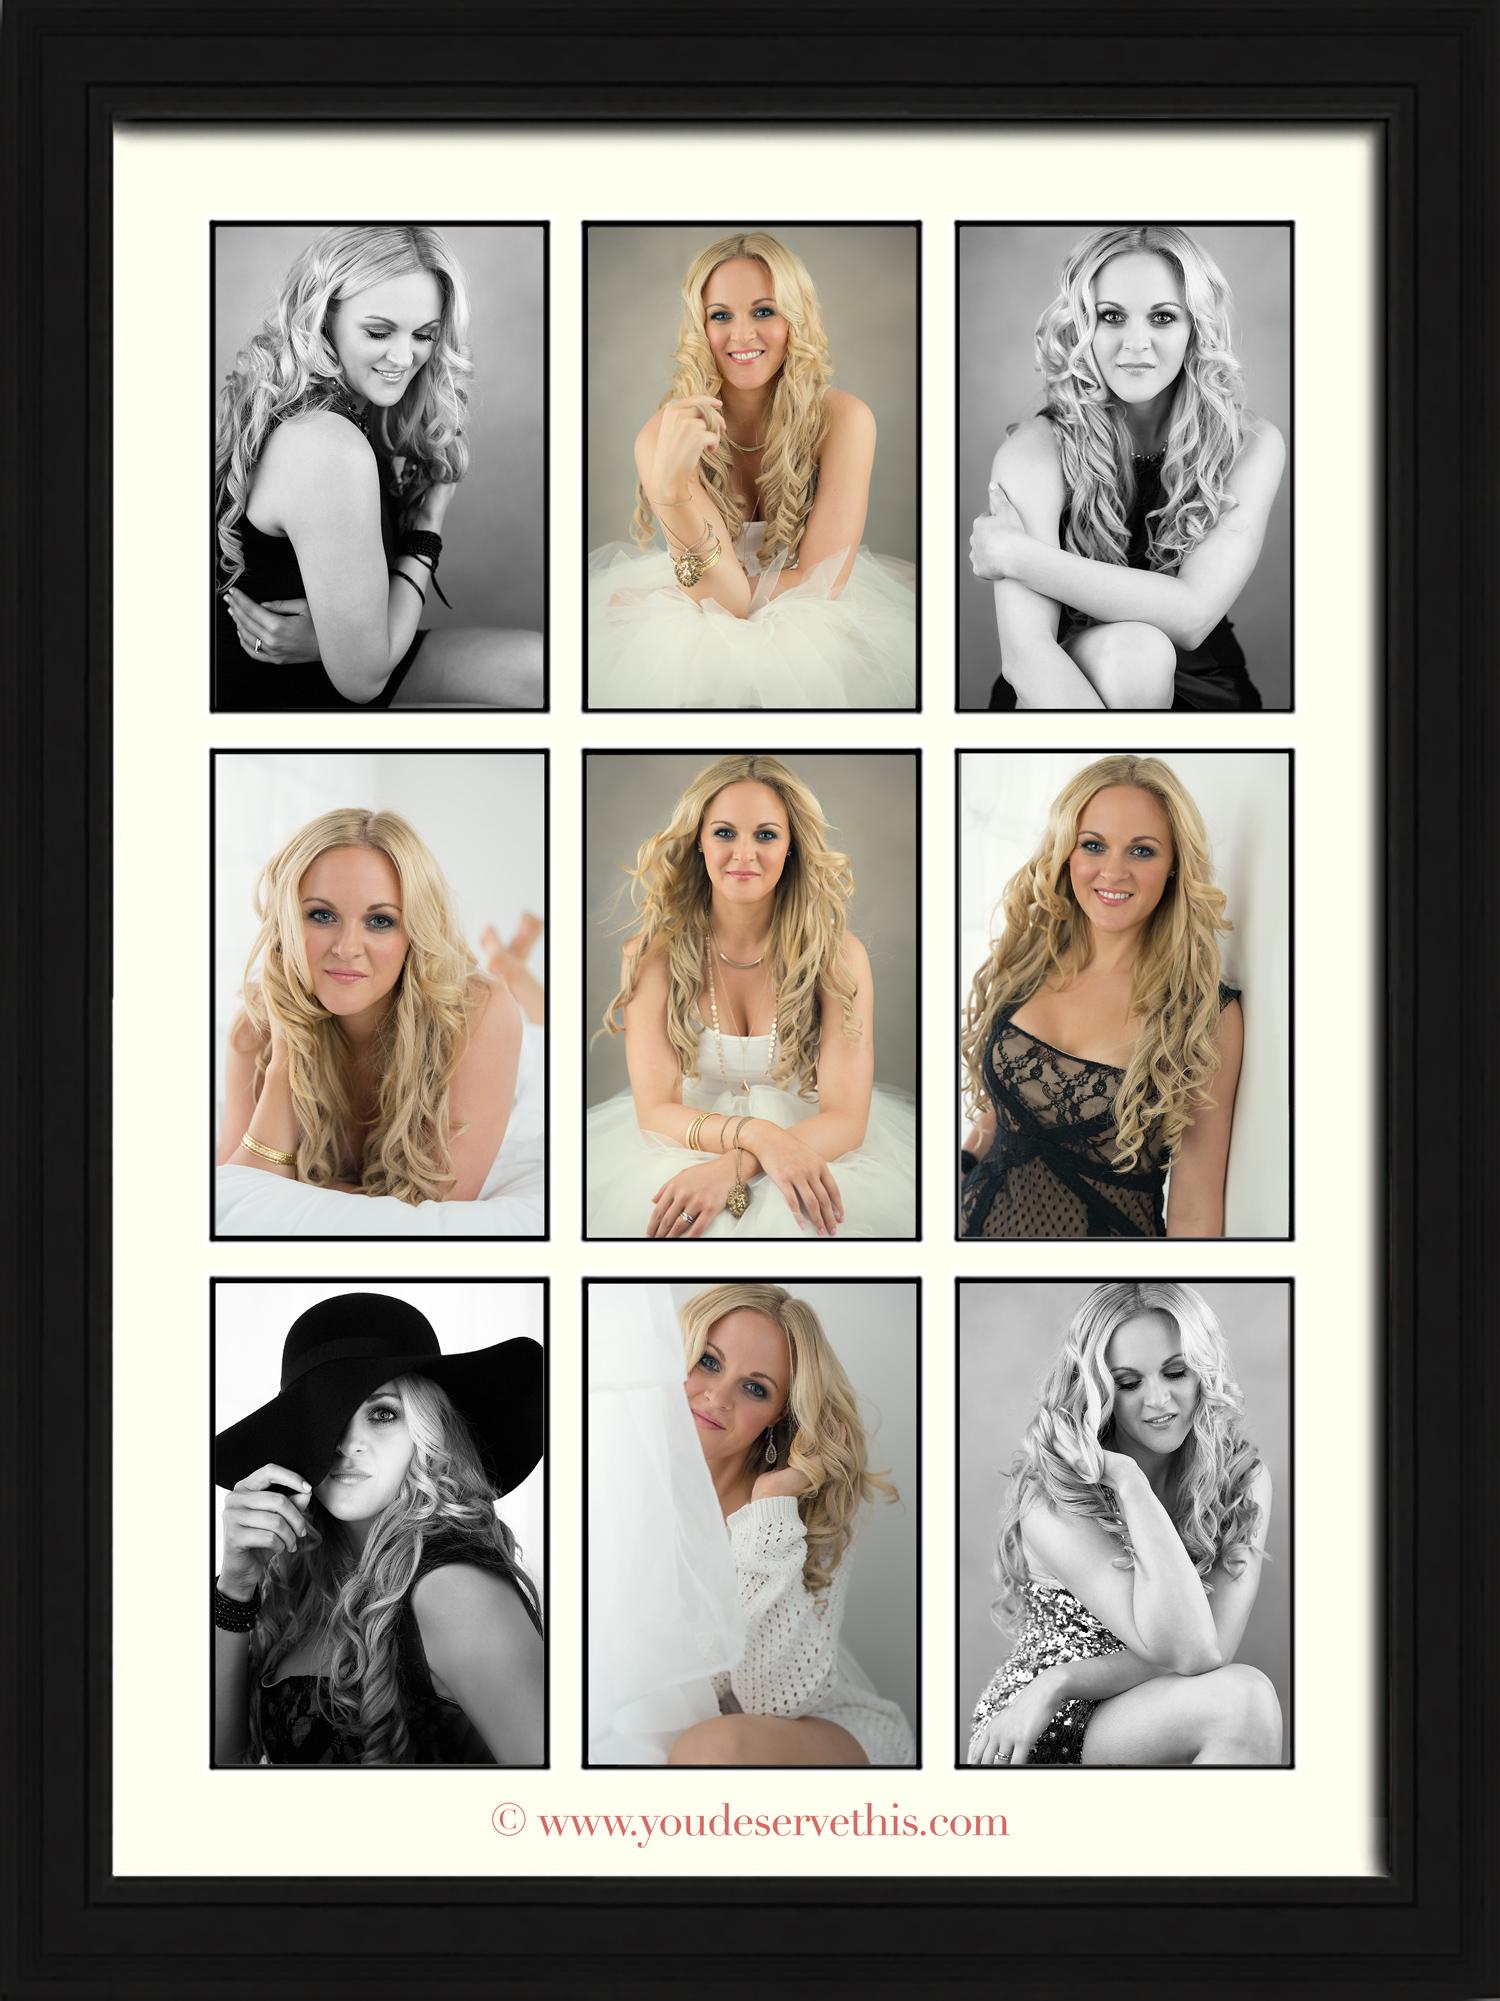 Nine Aperture Gallery Wall Portrait_YouDeserveThis Makeover and Photoshoot Studio -  www.youdeservethis.com